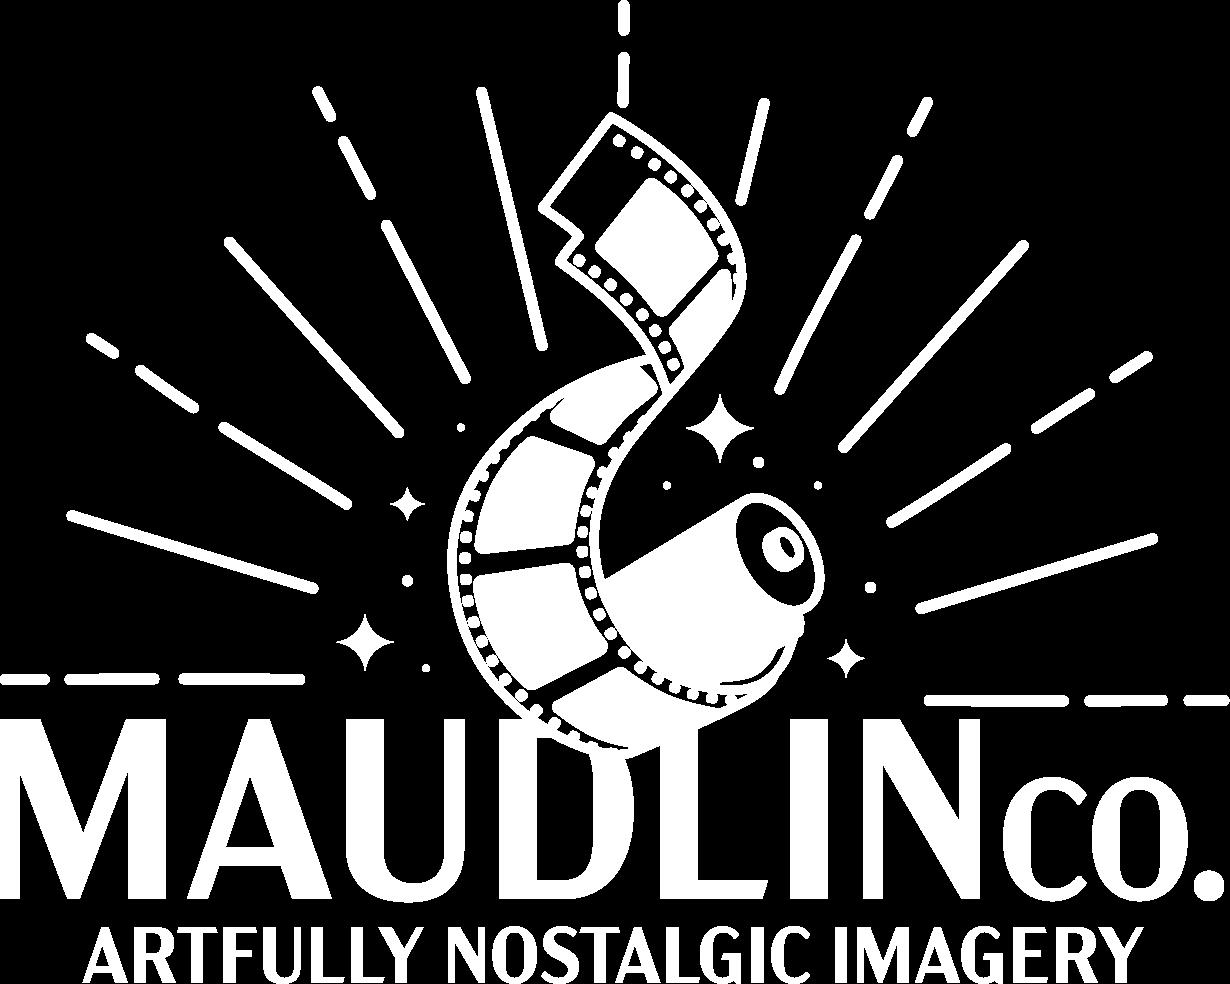 Maudlin Co.